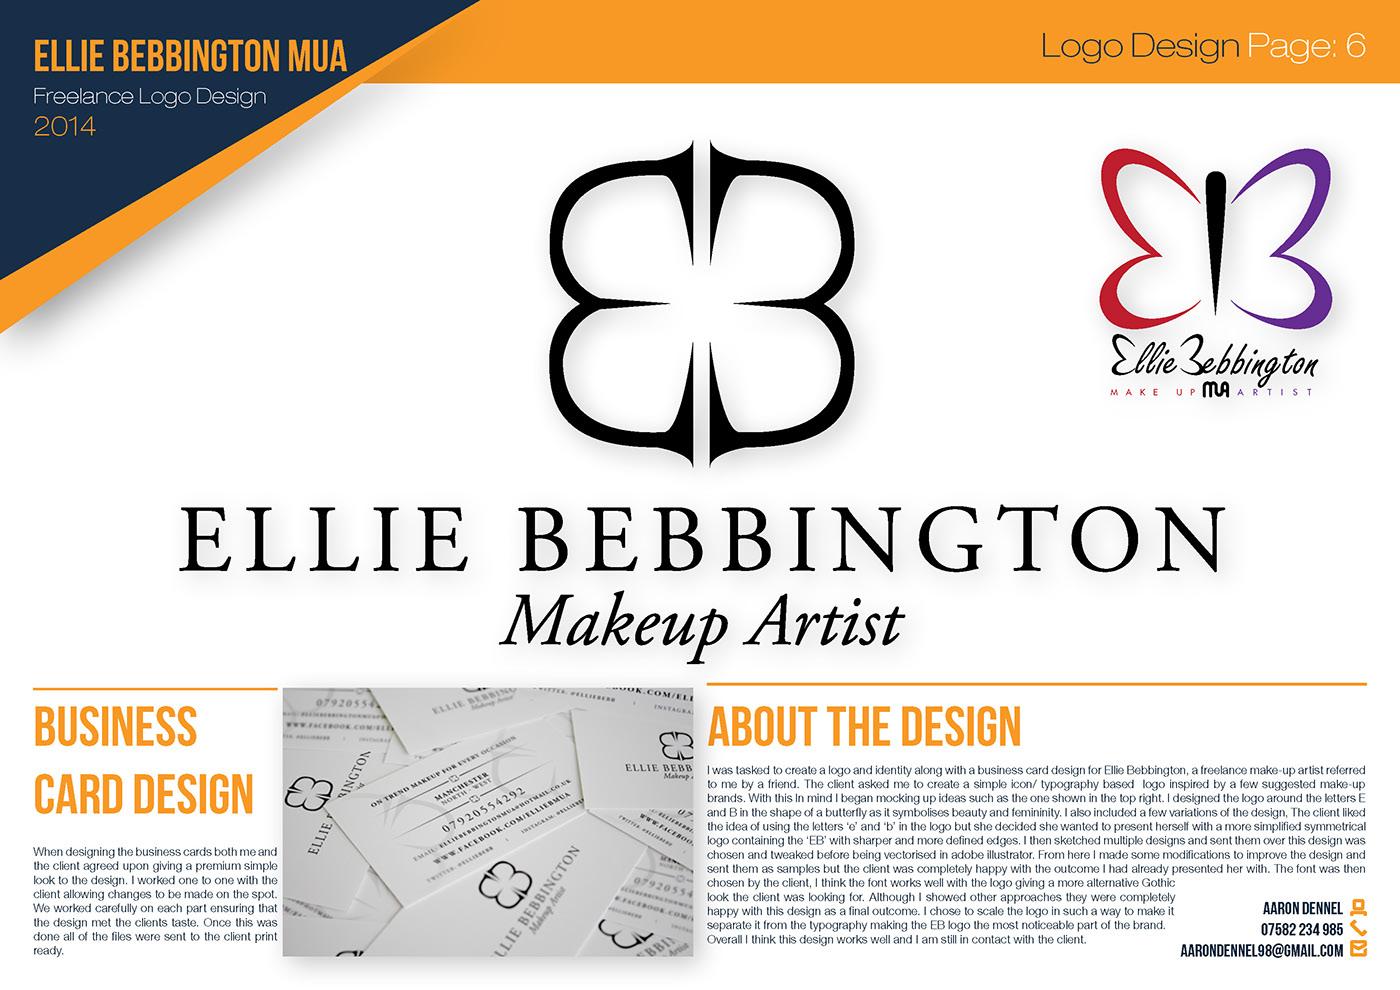 MUA design branding  logo eb Ellie Bebbington gothic serif